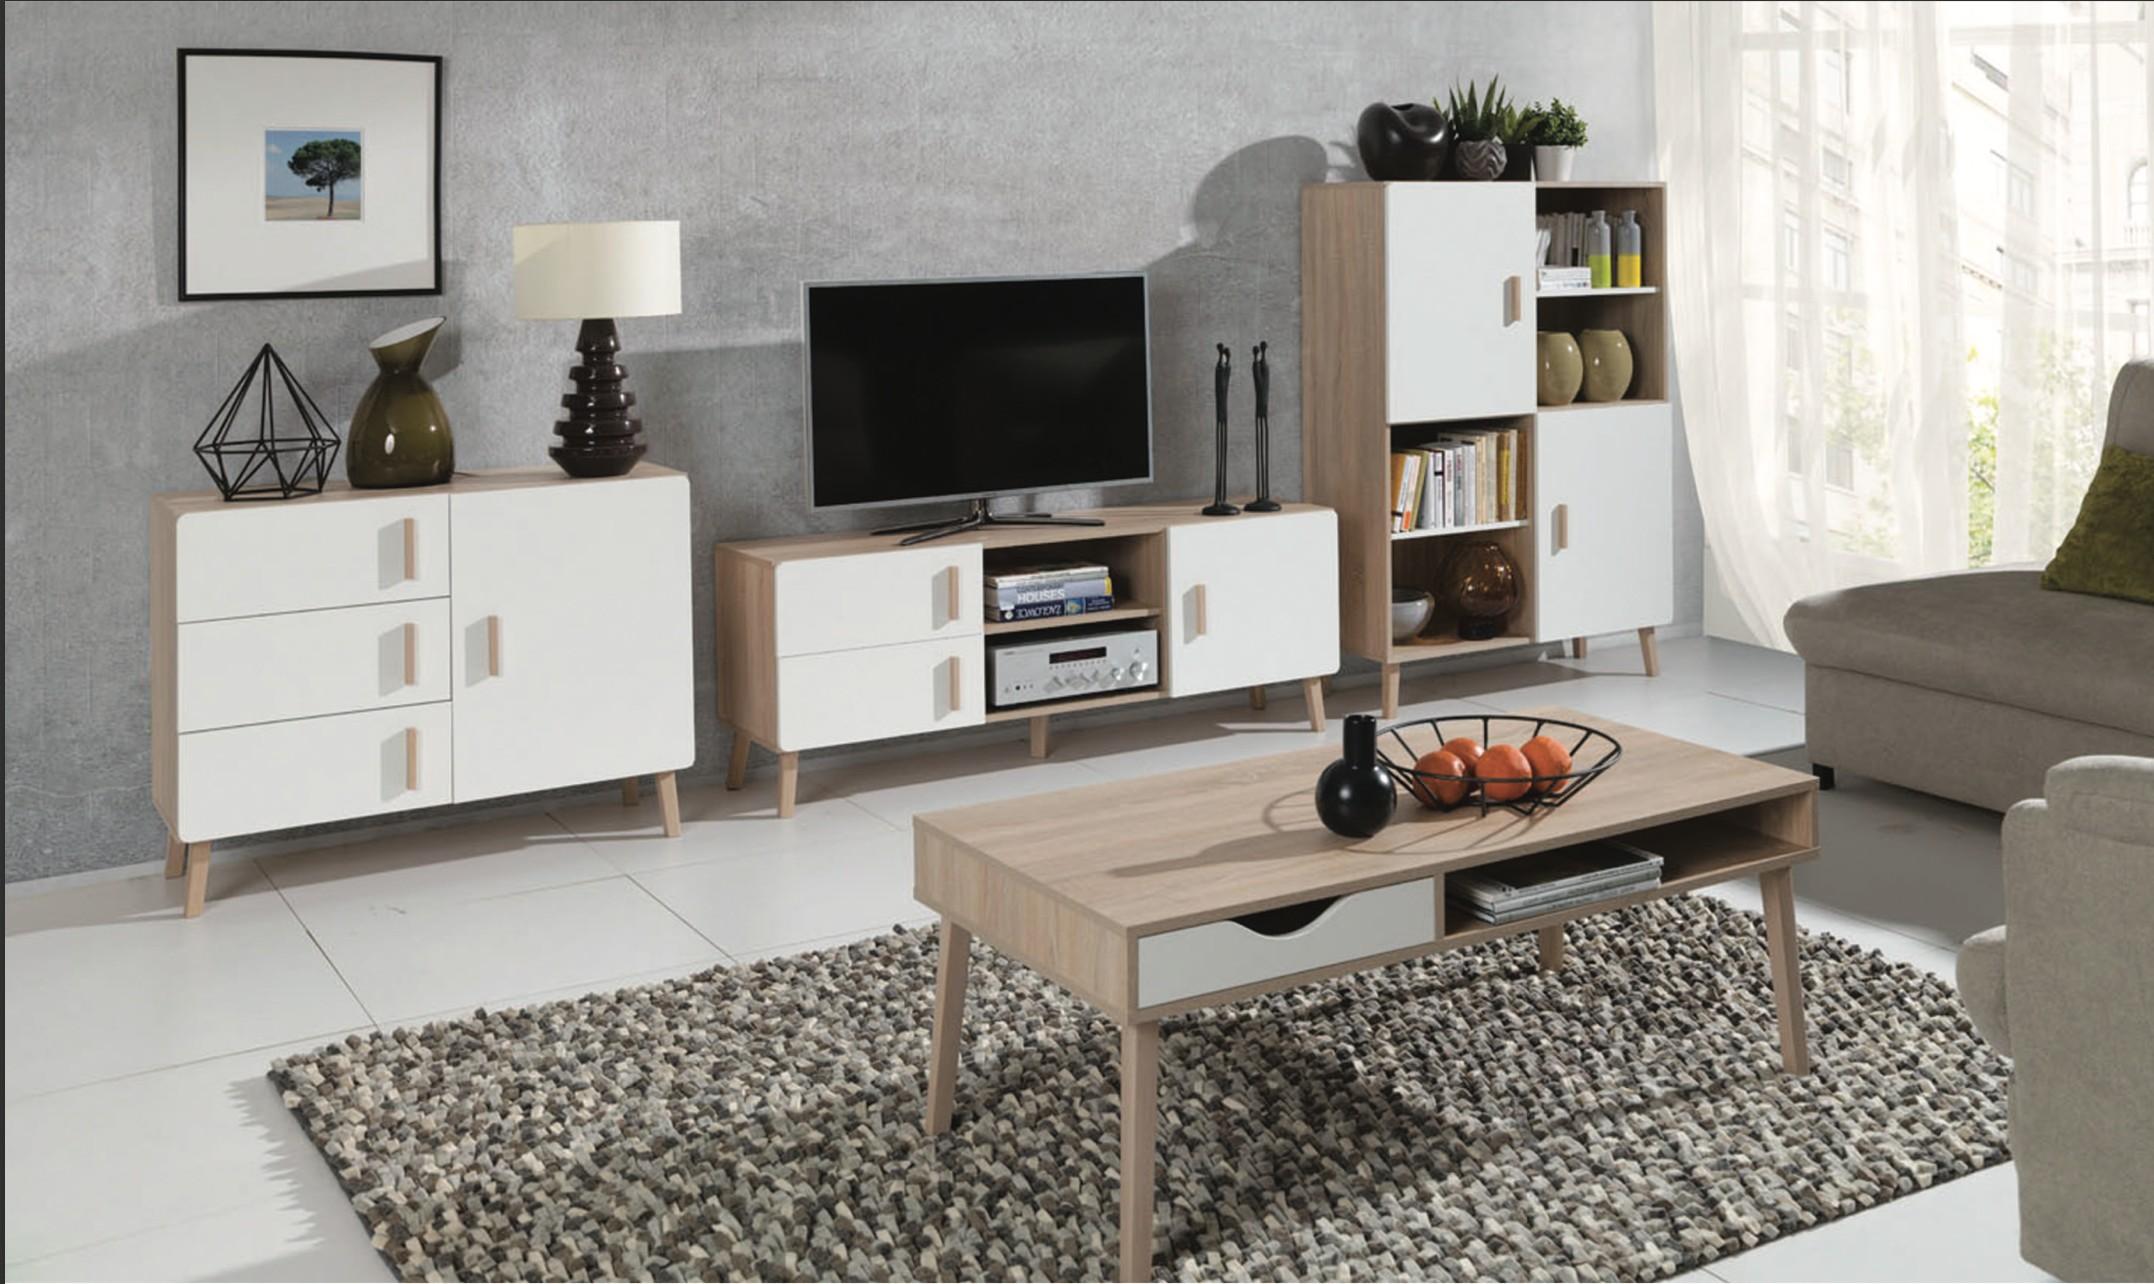 Meuble Tv Avec Bibliothèque price factory